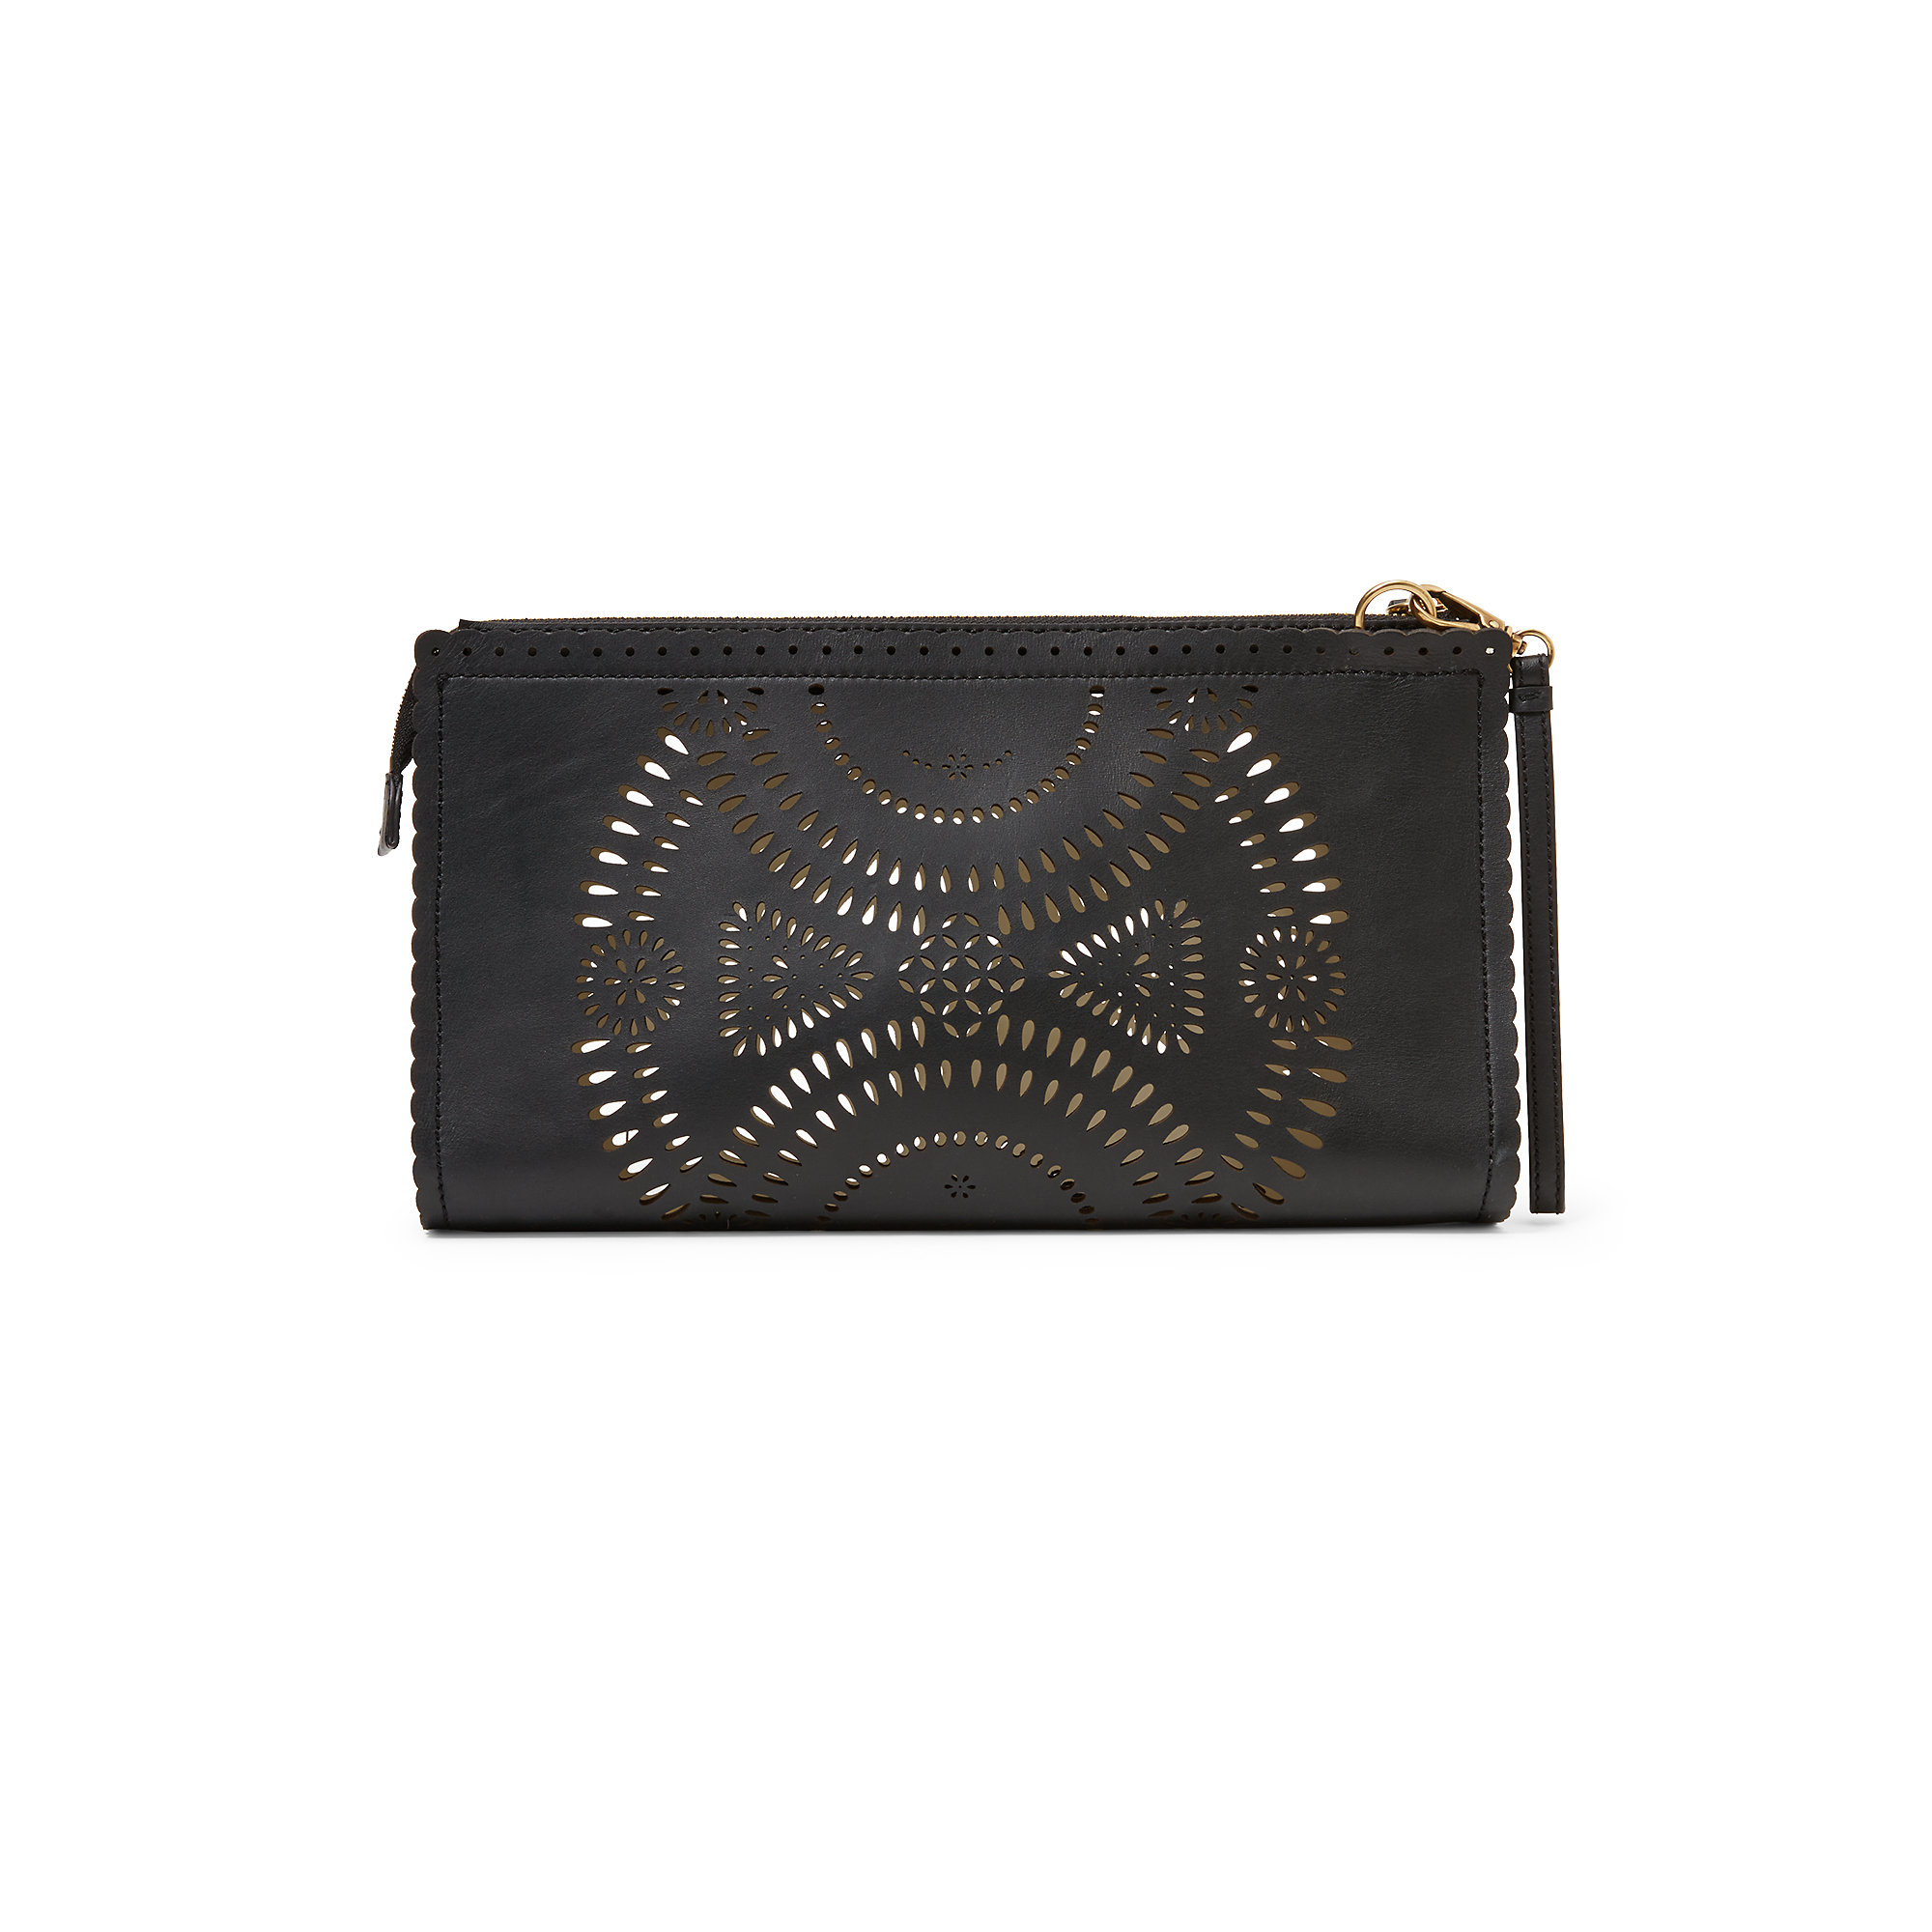 Lyst - Polo Ralph Lauren Laser-cut Leather Clutch in Black 1607bd7d699f1